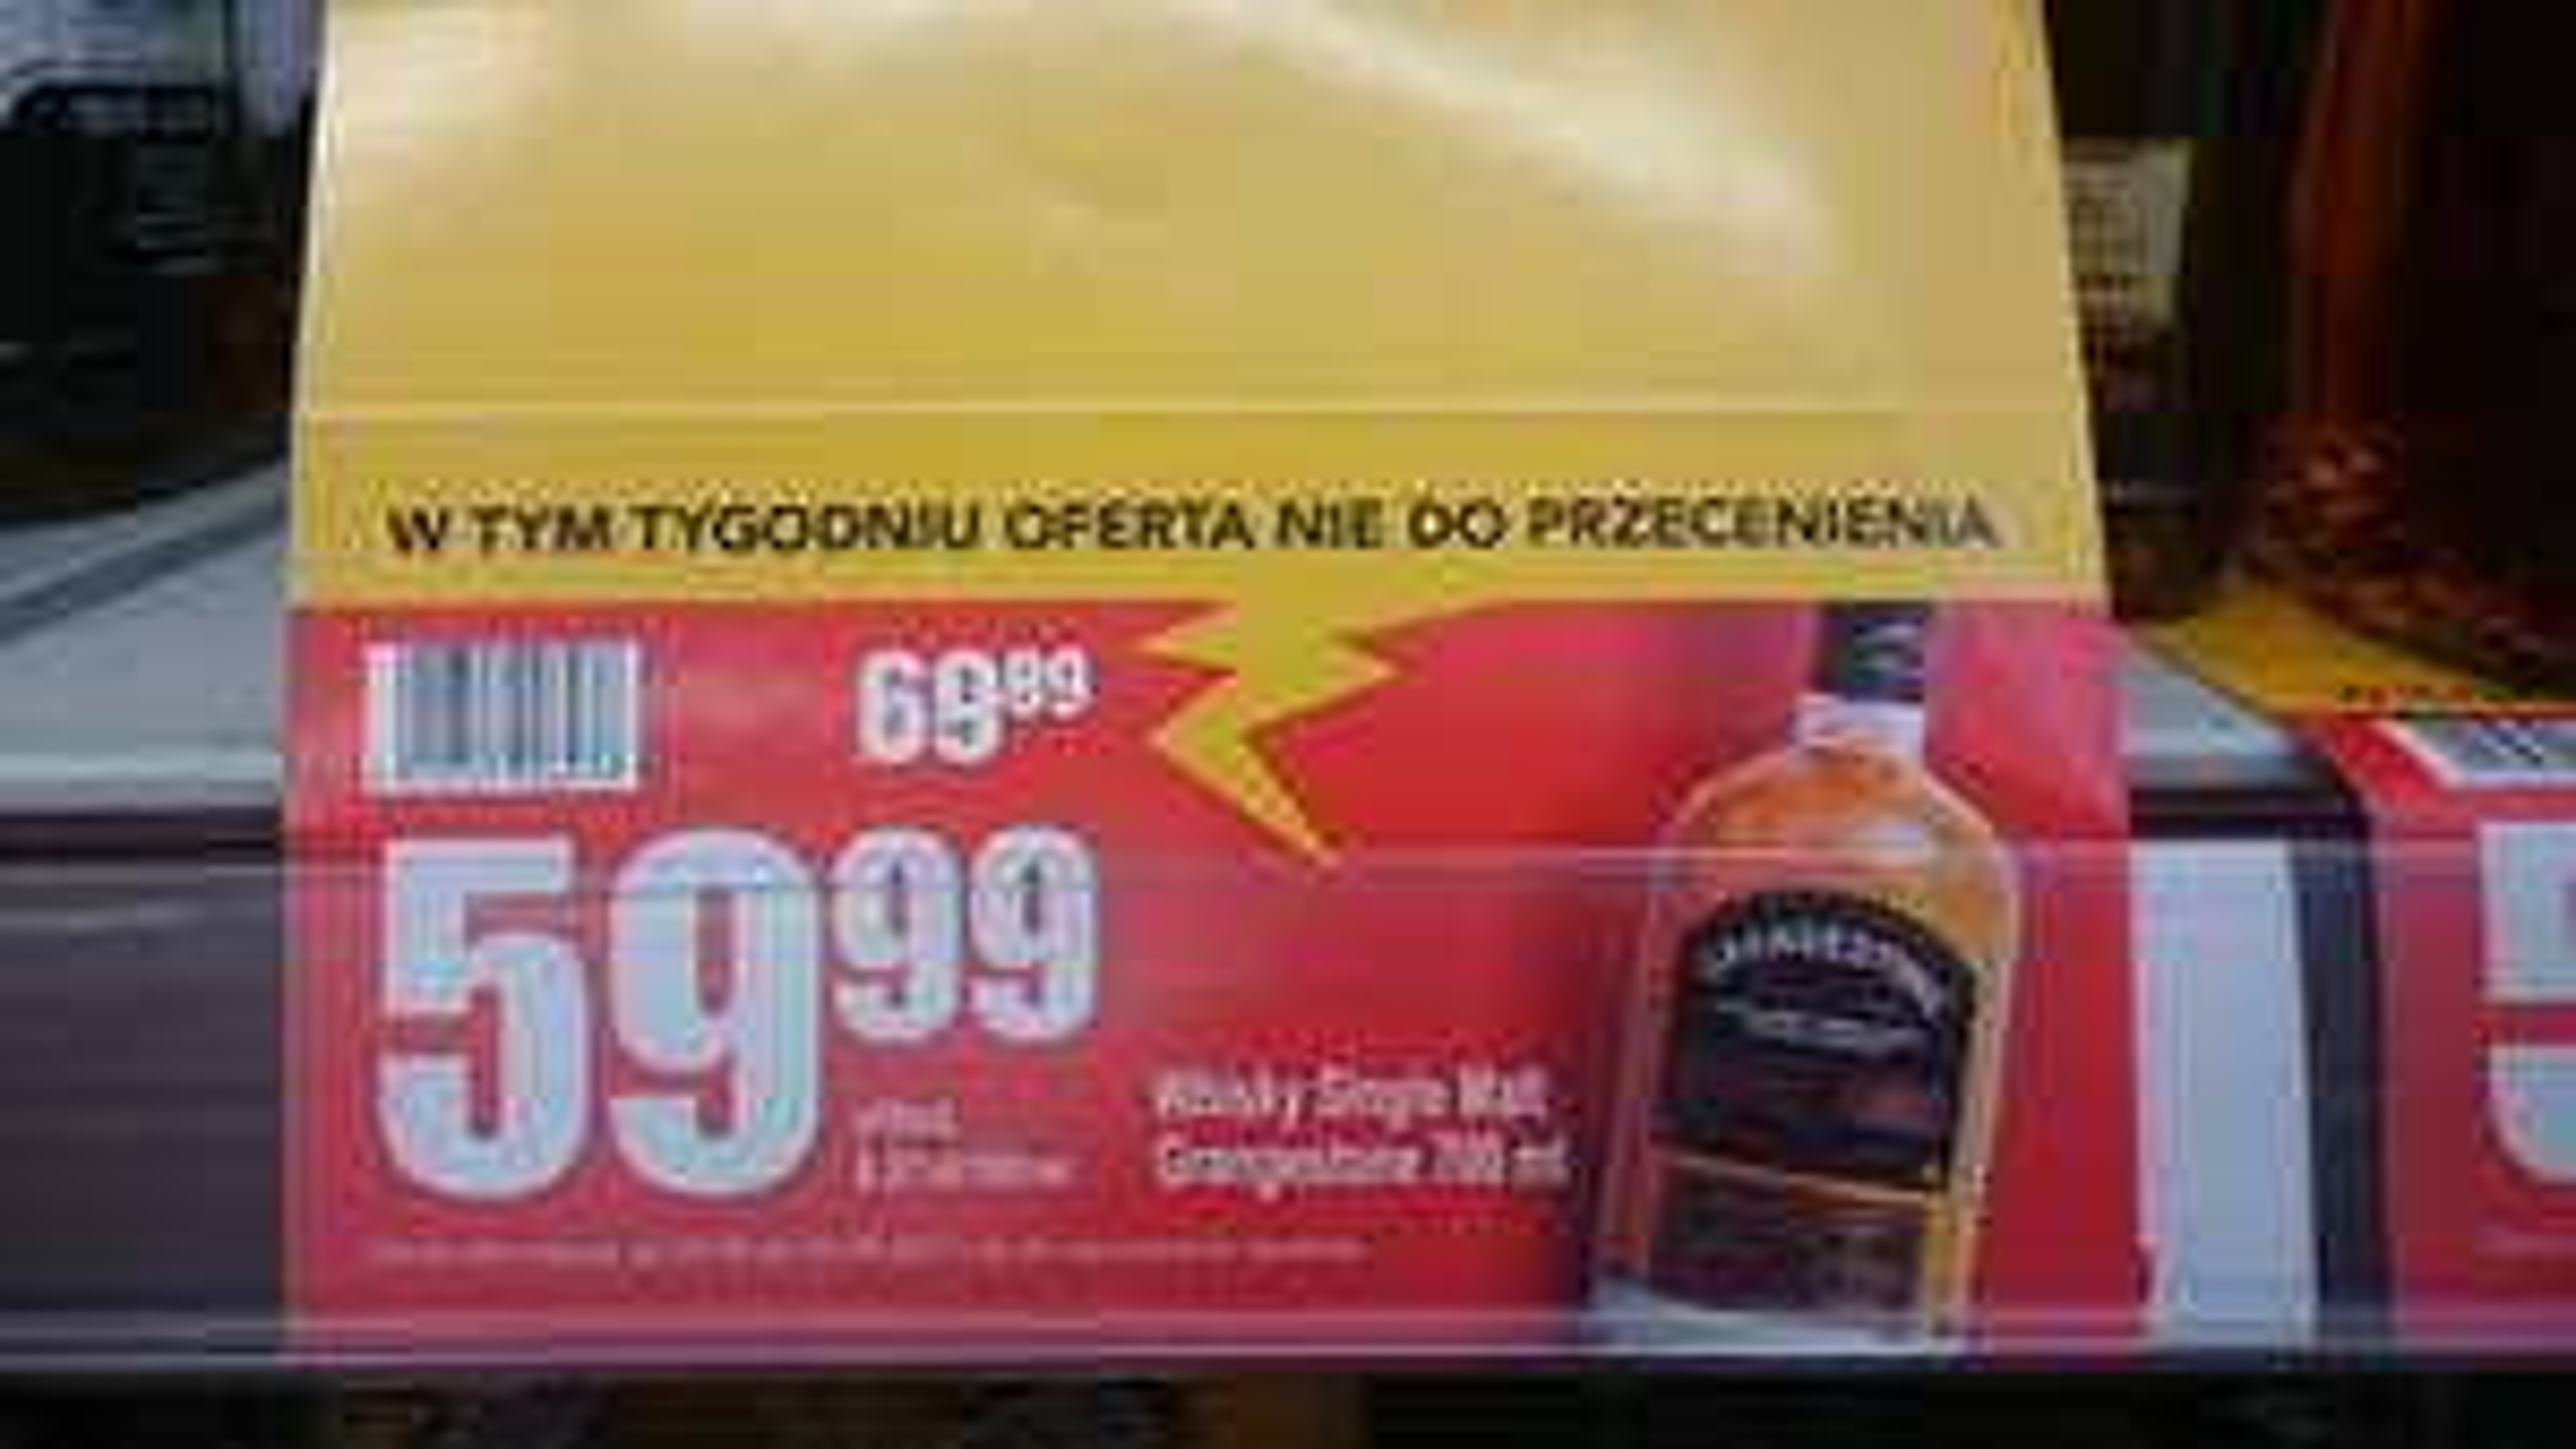 Whisky Single Malt Grangestone ! Najtańszy Single Malt na rynku !